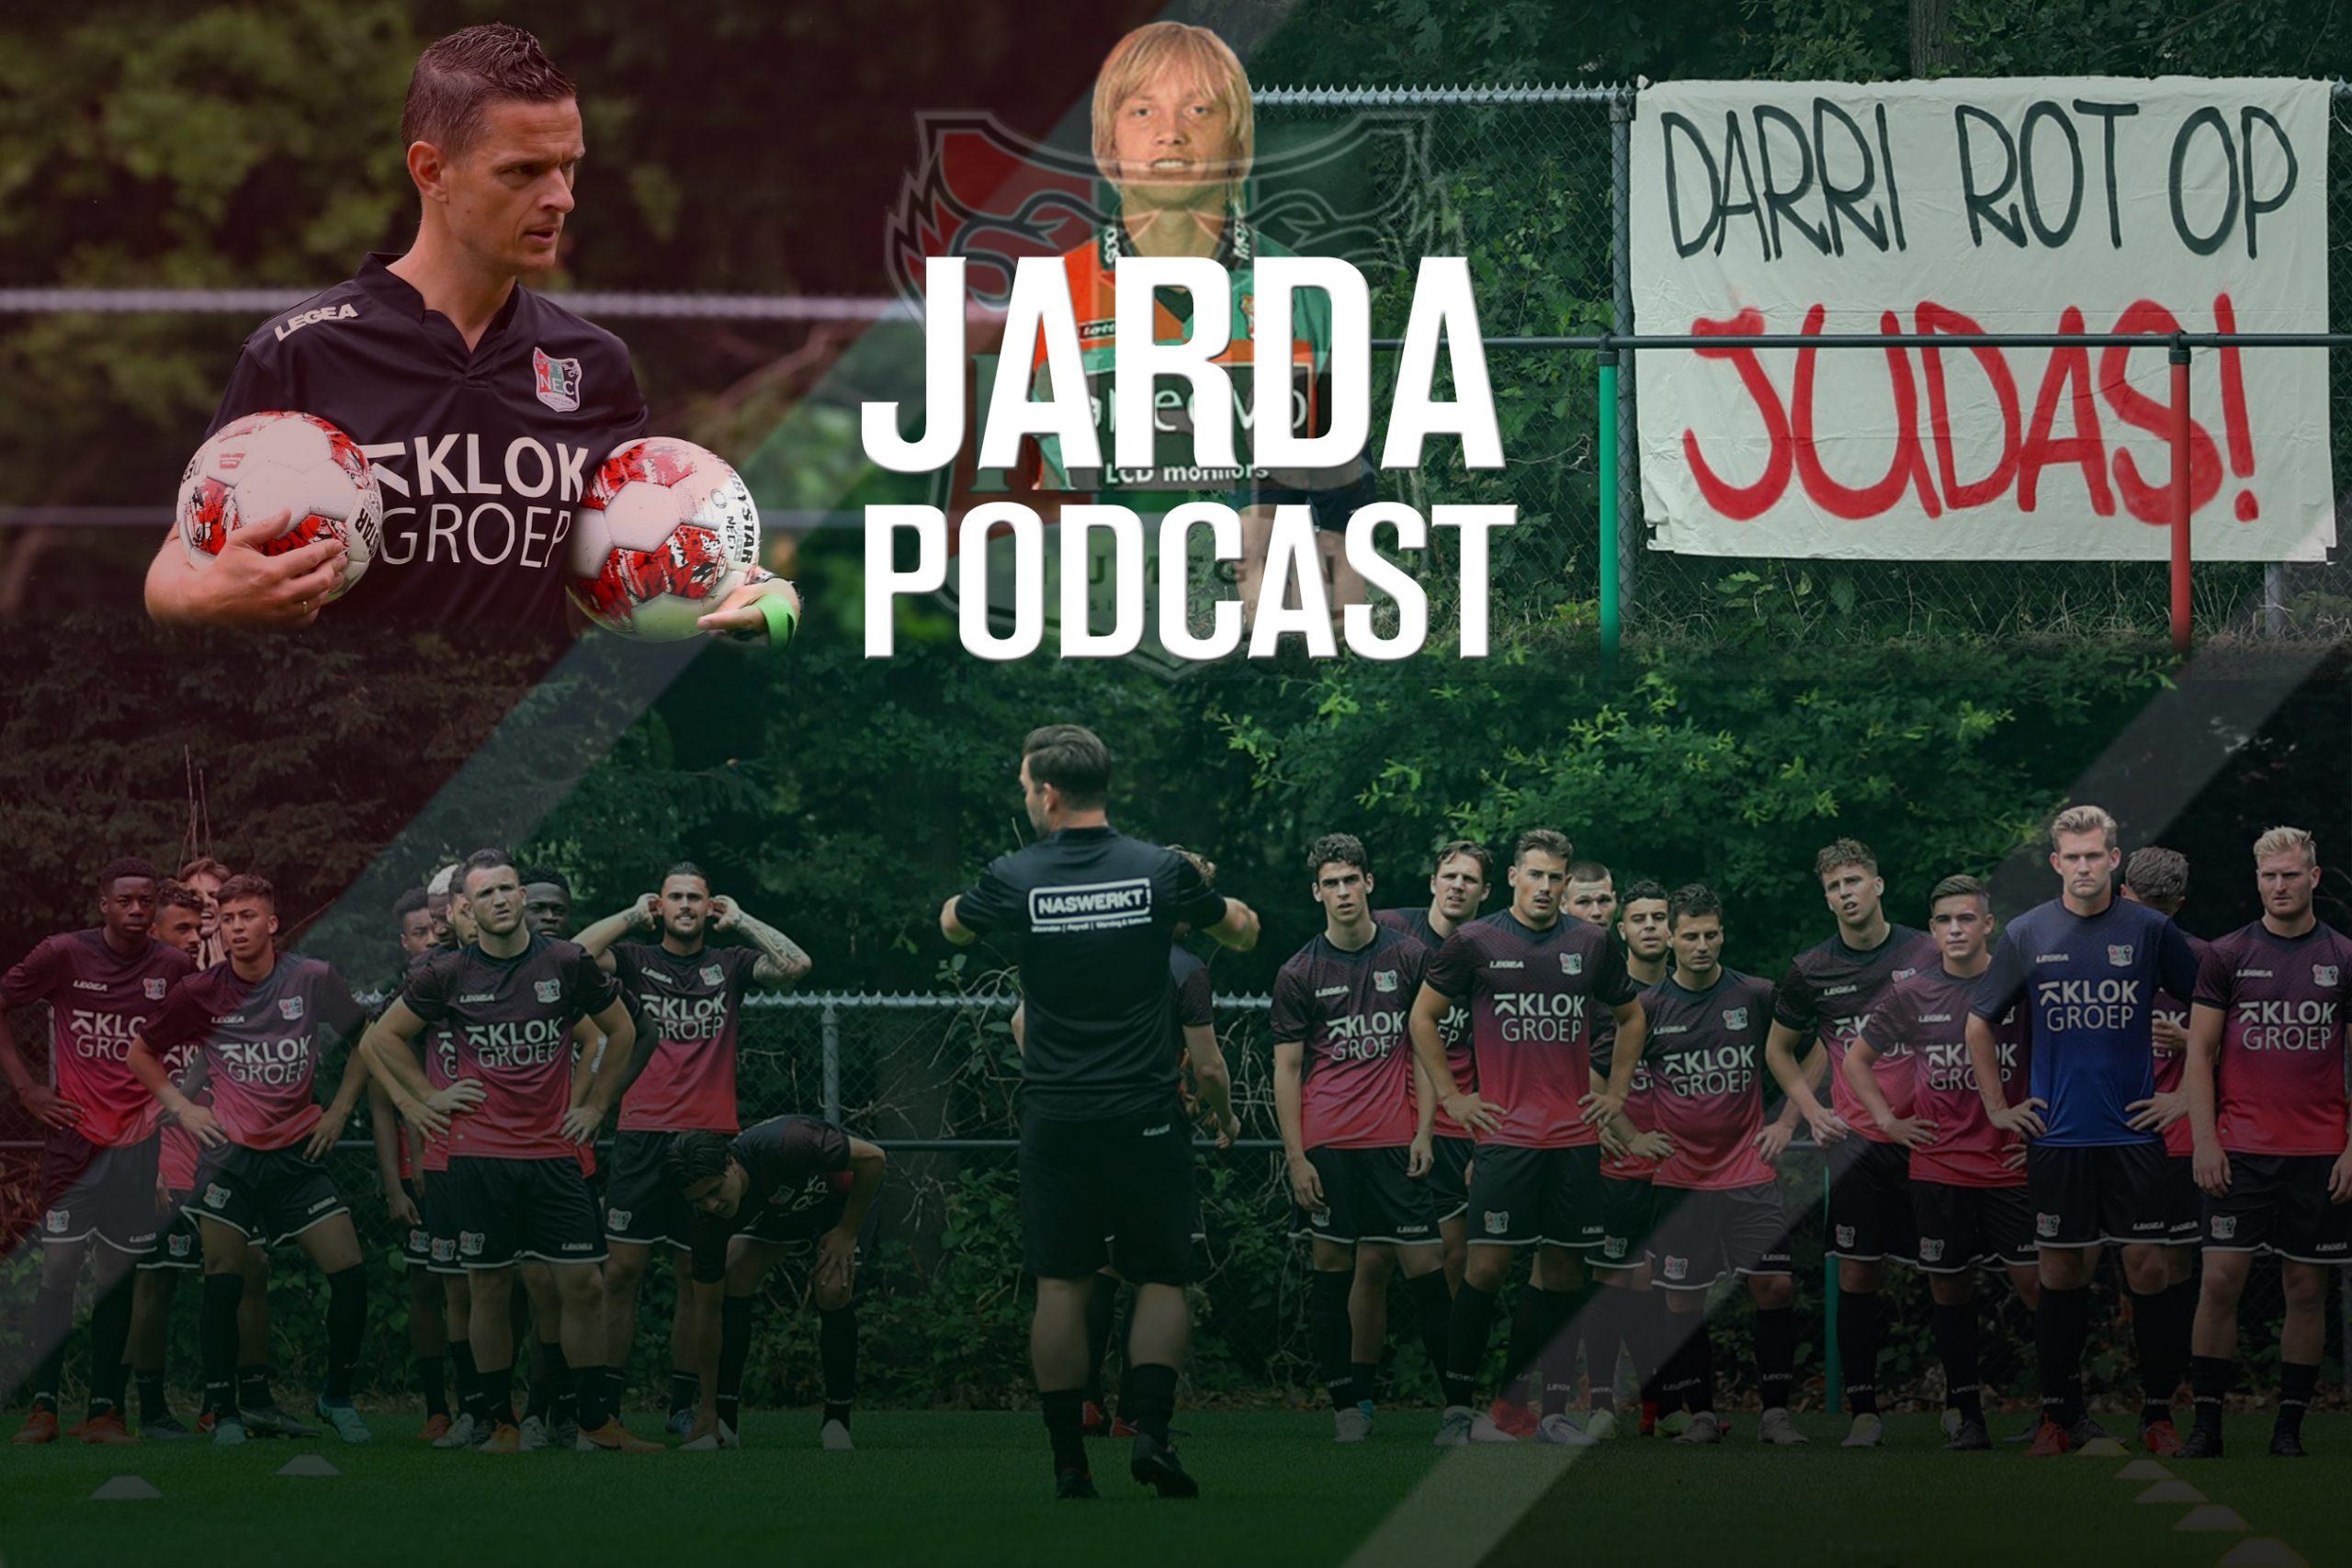 Jarda Podcast #11: Darri Gate, 'frisse' start en duiken in de cijfertjes